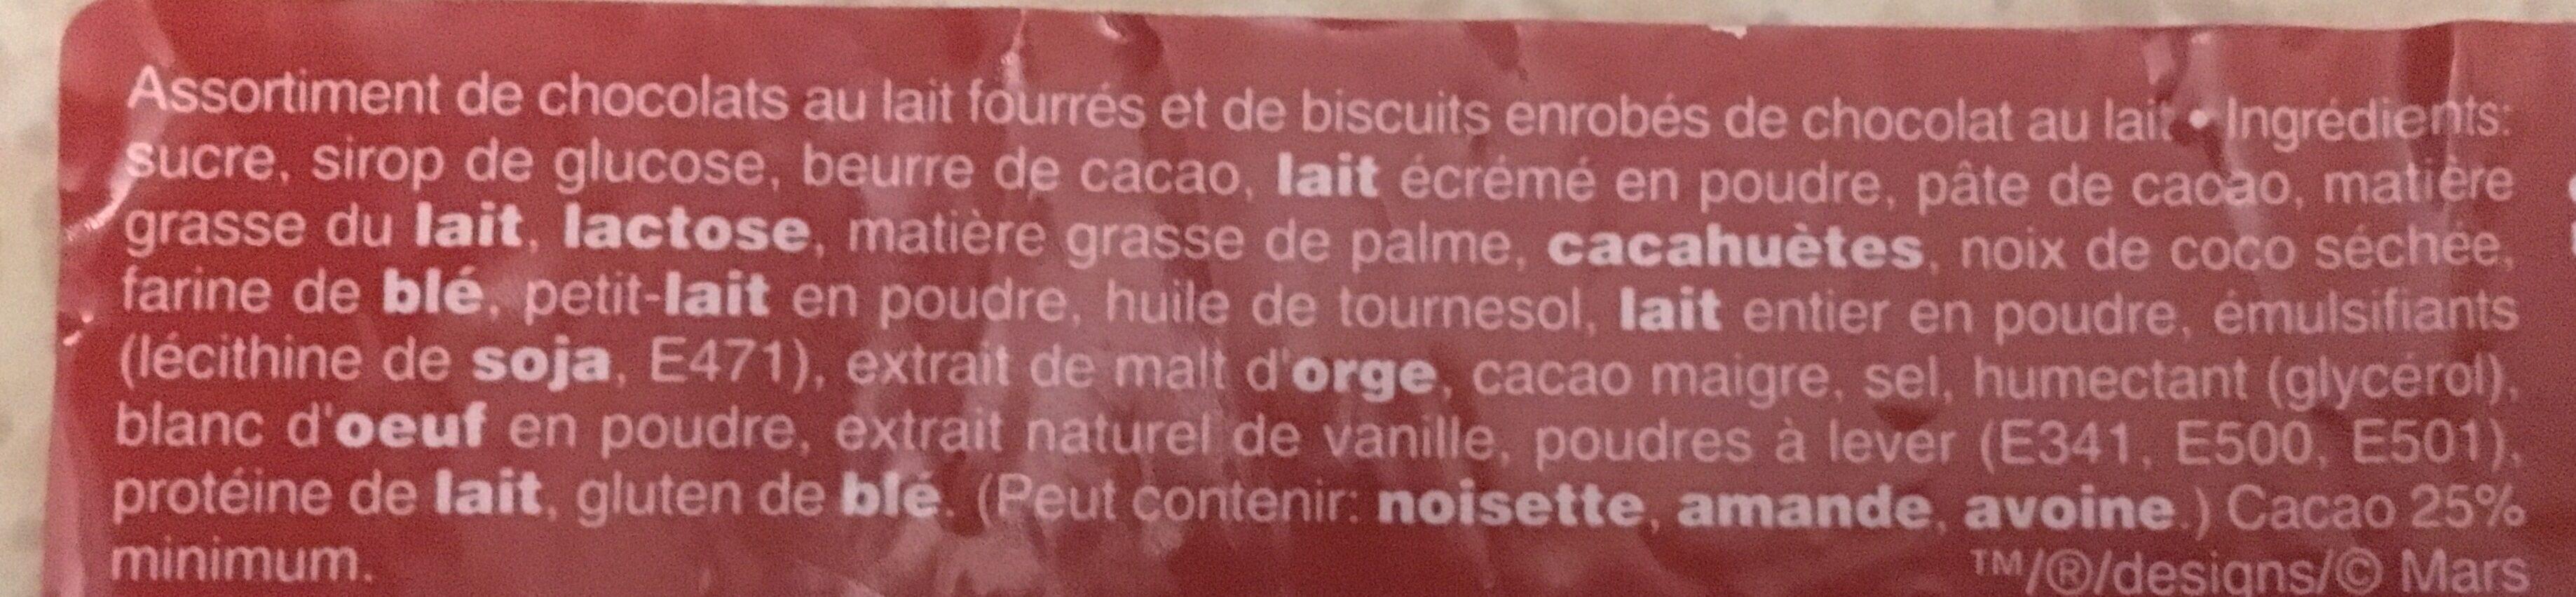 Bonbons chocolat Célébrations - Ingrédients - fr